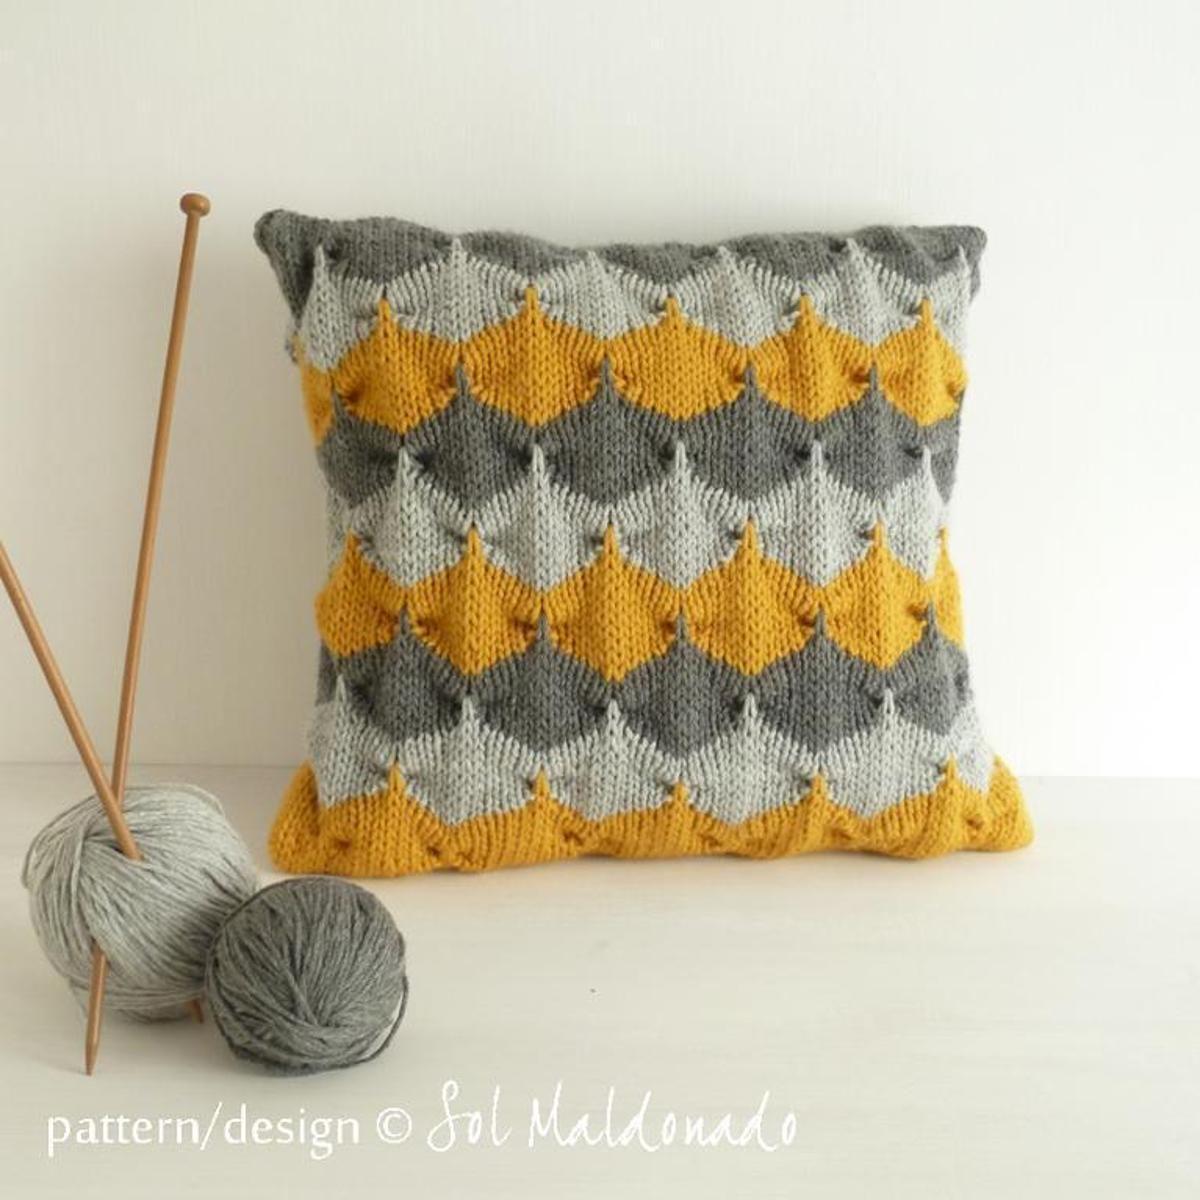 Geometric Cushion Decorative Knit Pillow